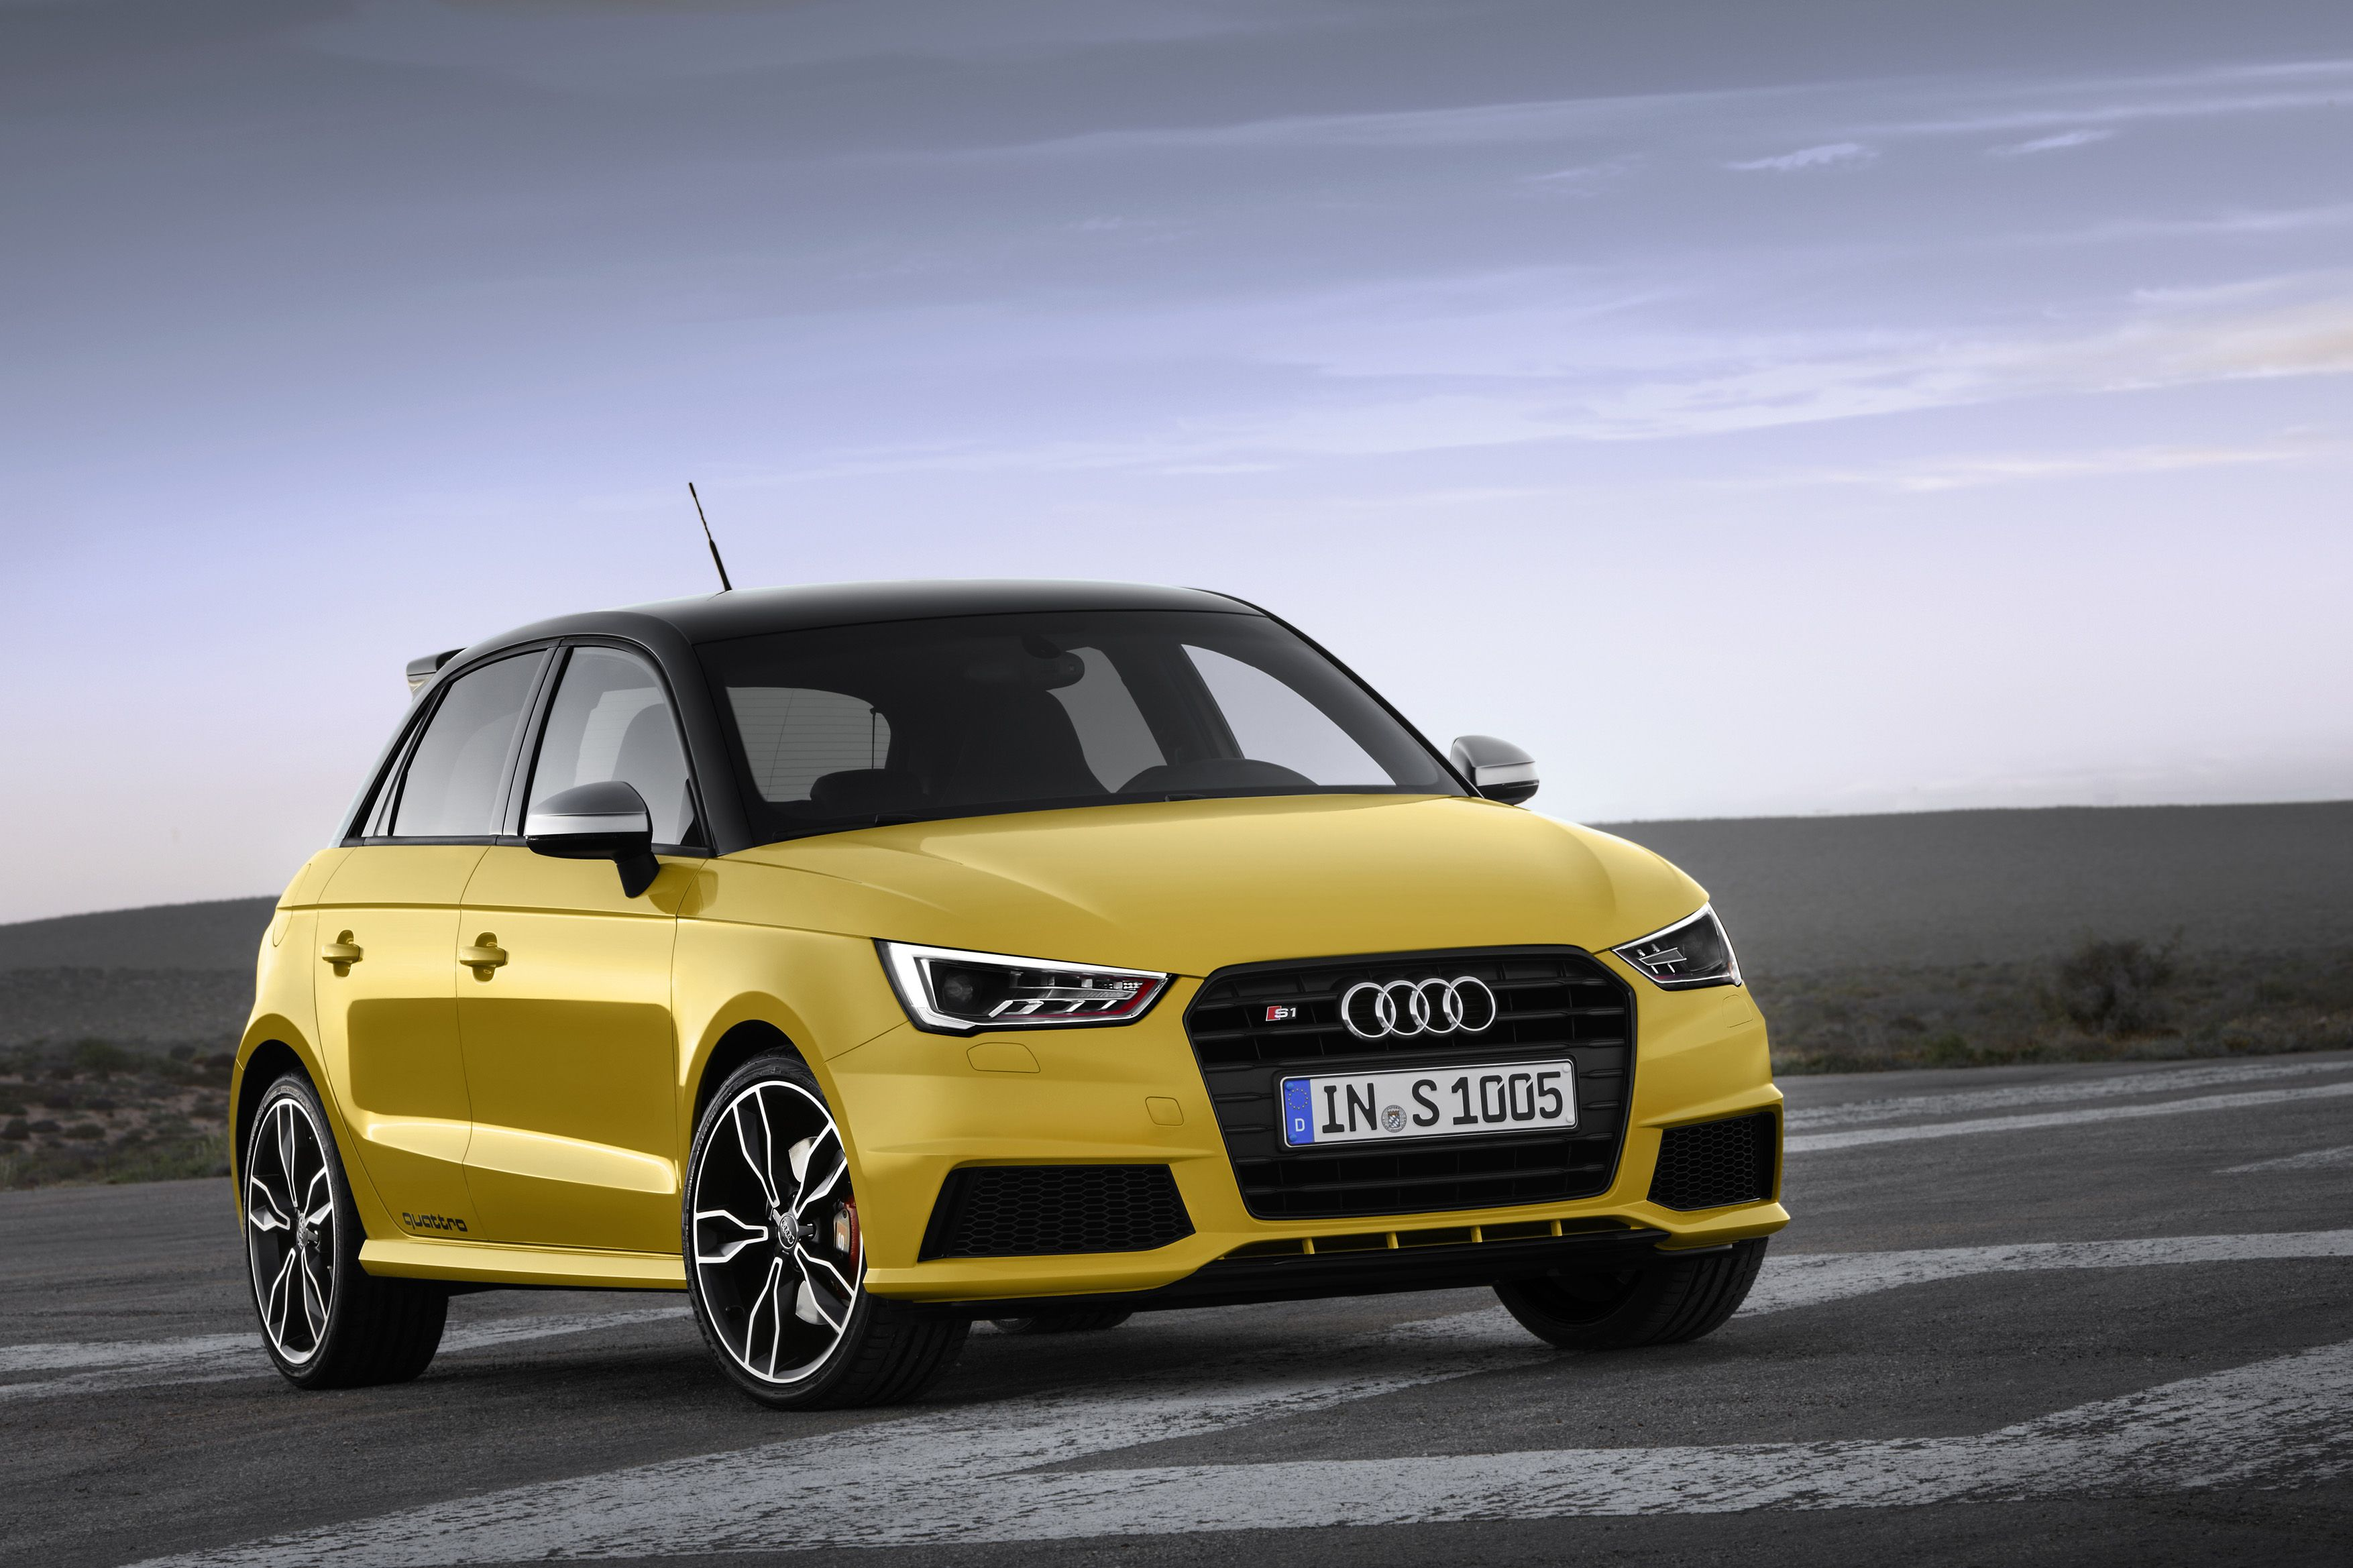 Audi S1 Sportback - Audi S1 Quattro 2019 , HD Wallpaper & Backgrounds